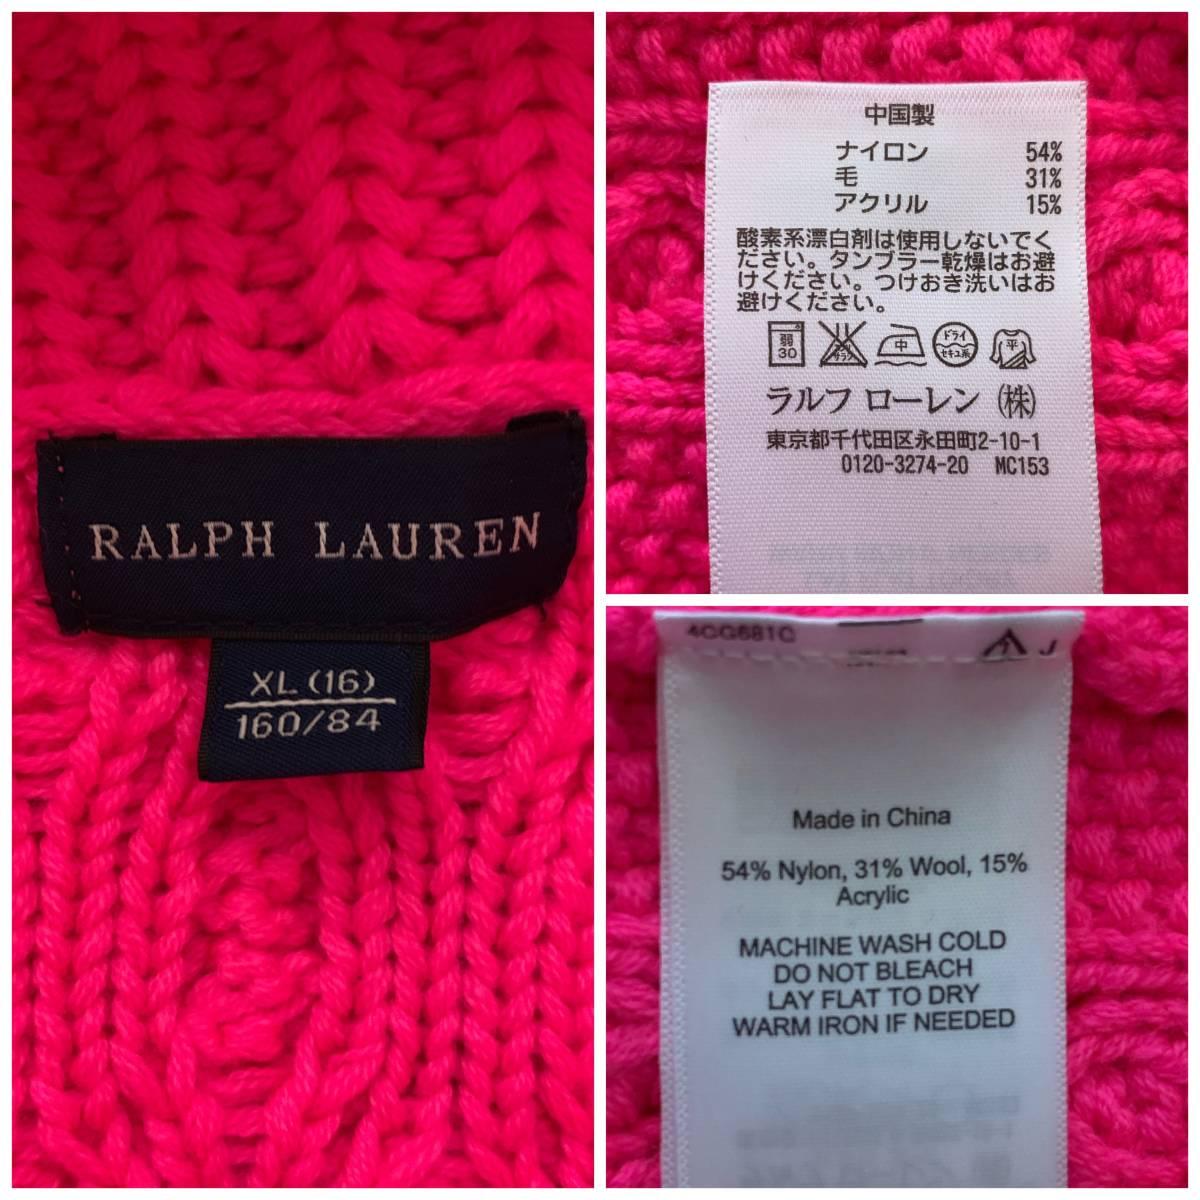 ★RALPH LAUREN ラルフローレン タートルネック コットン ケーブル ニット セーター ピンク XL_画像3